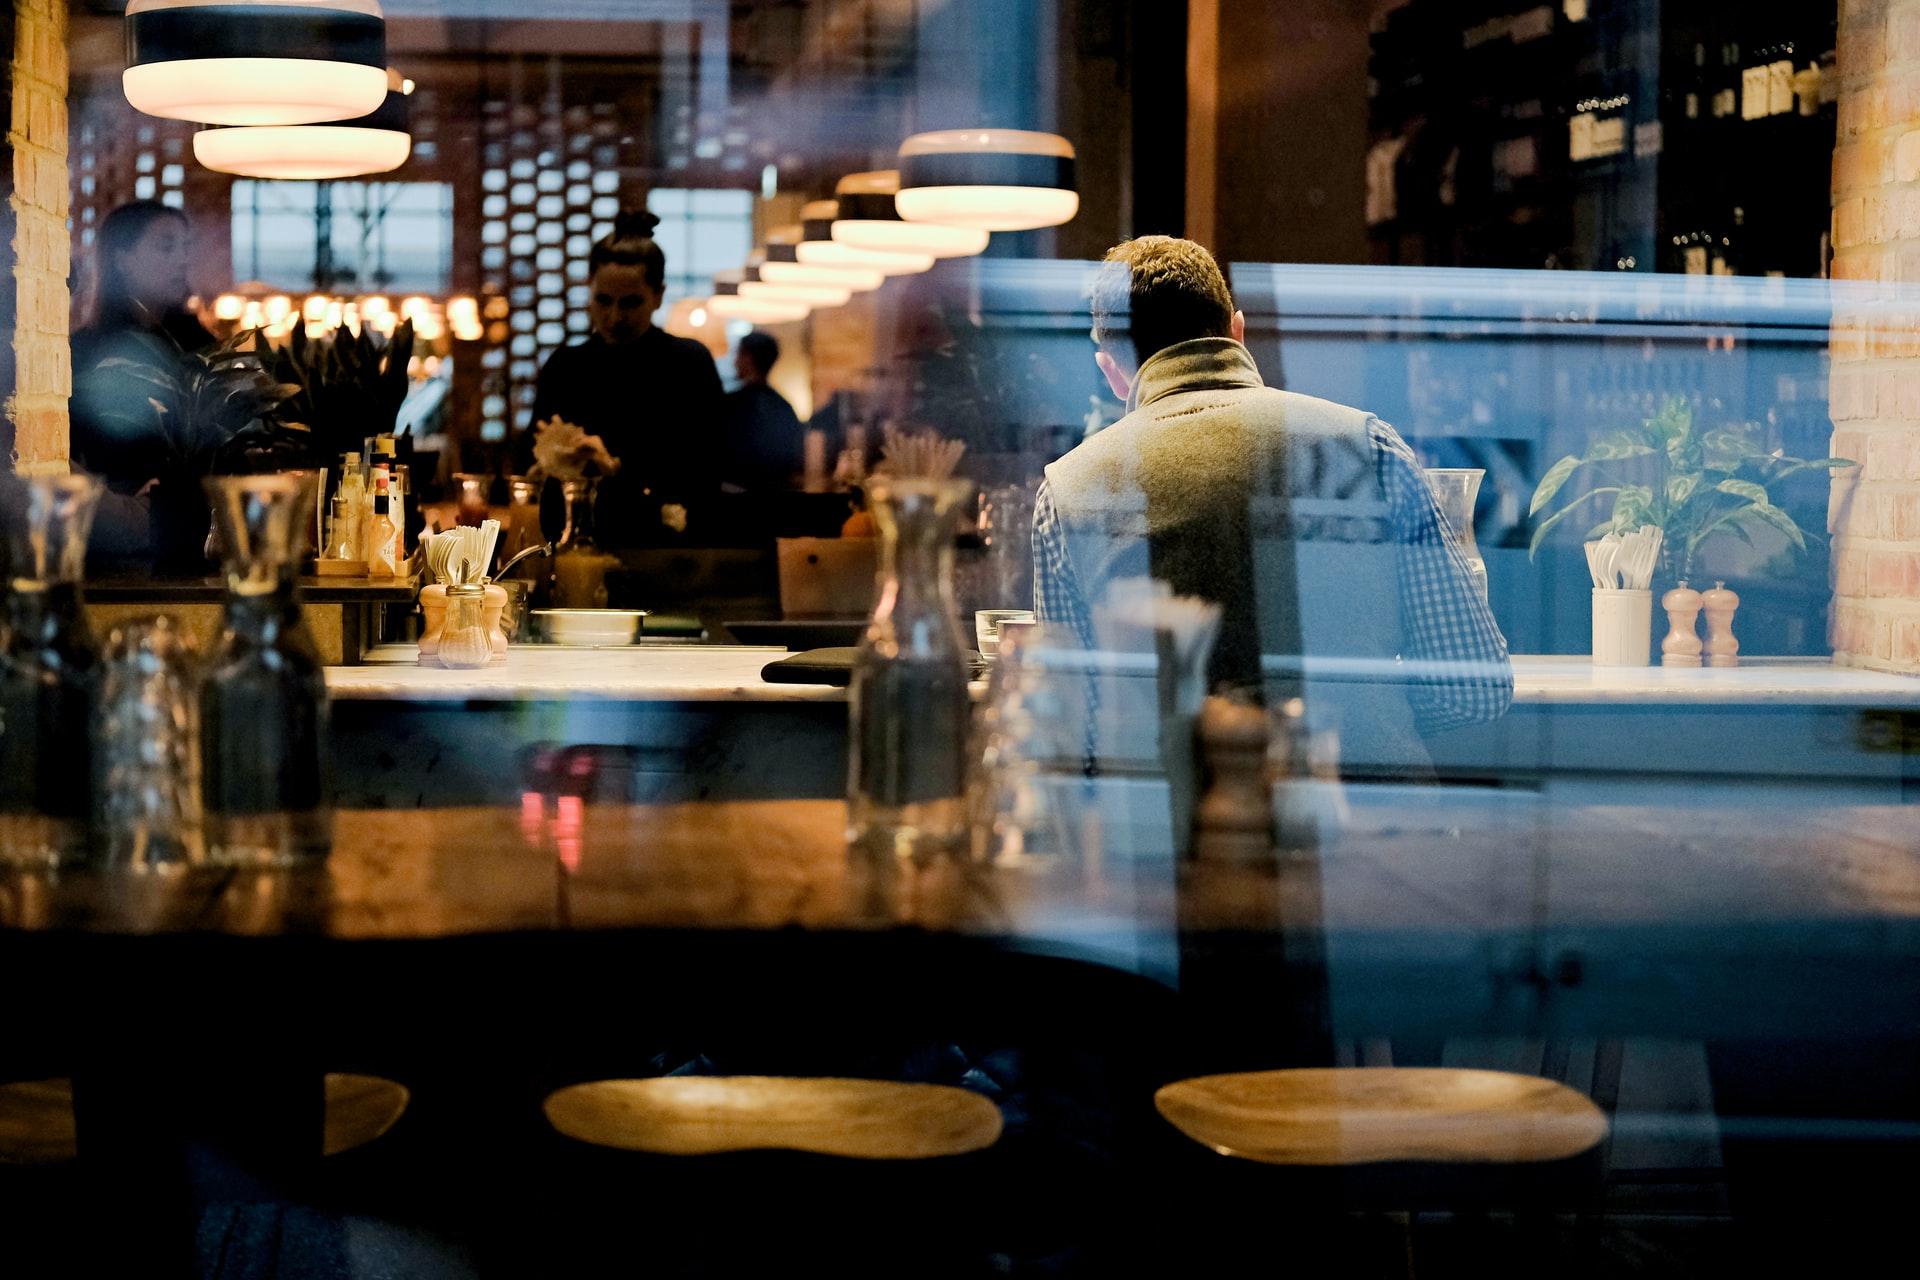 restaurant and bar interior